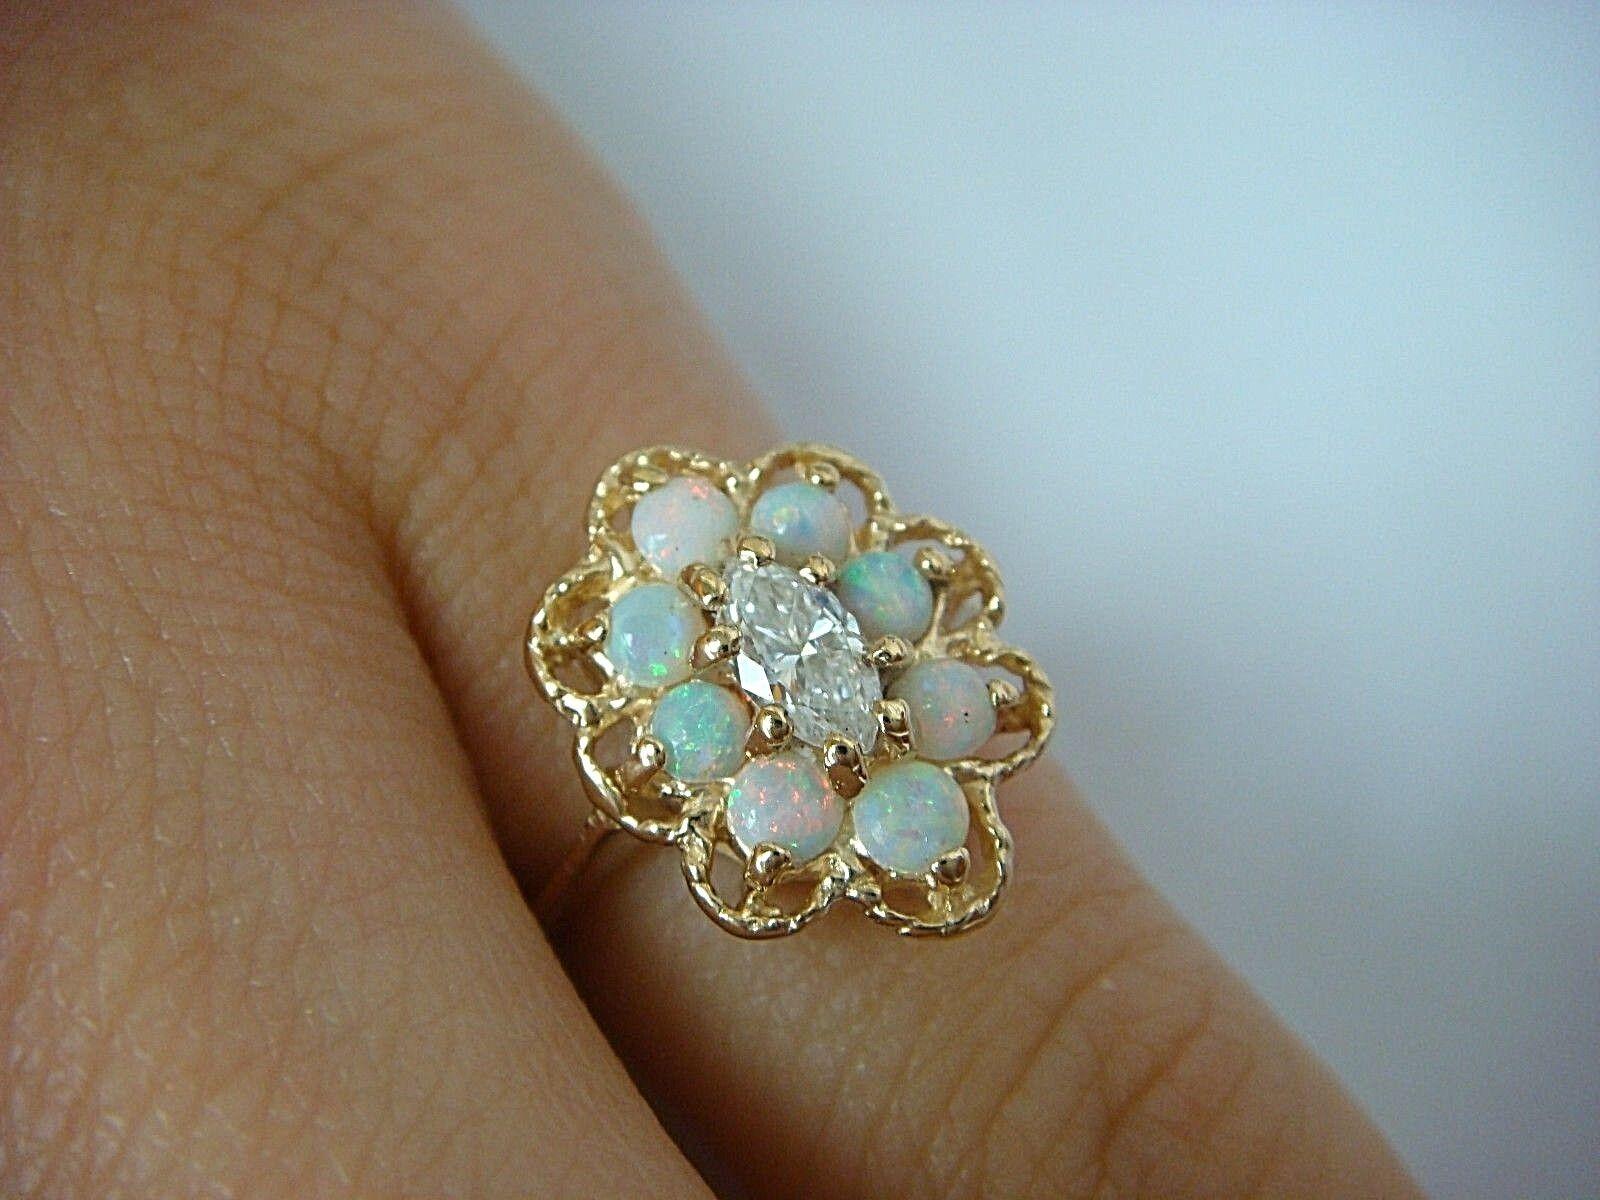 14K YELLOW gold 0.20 CT MARQUISE DIAMOND & OPALS FLOWER DESIGN LADIES RING